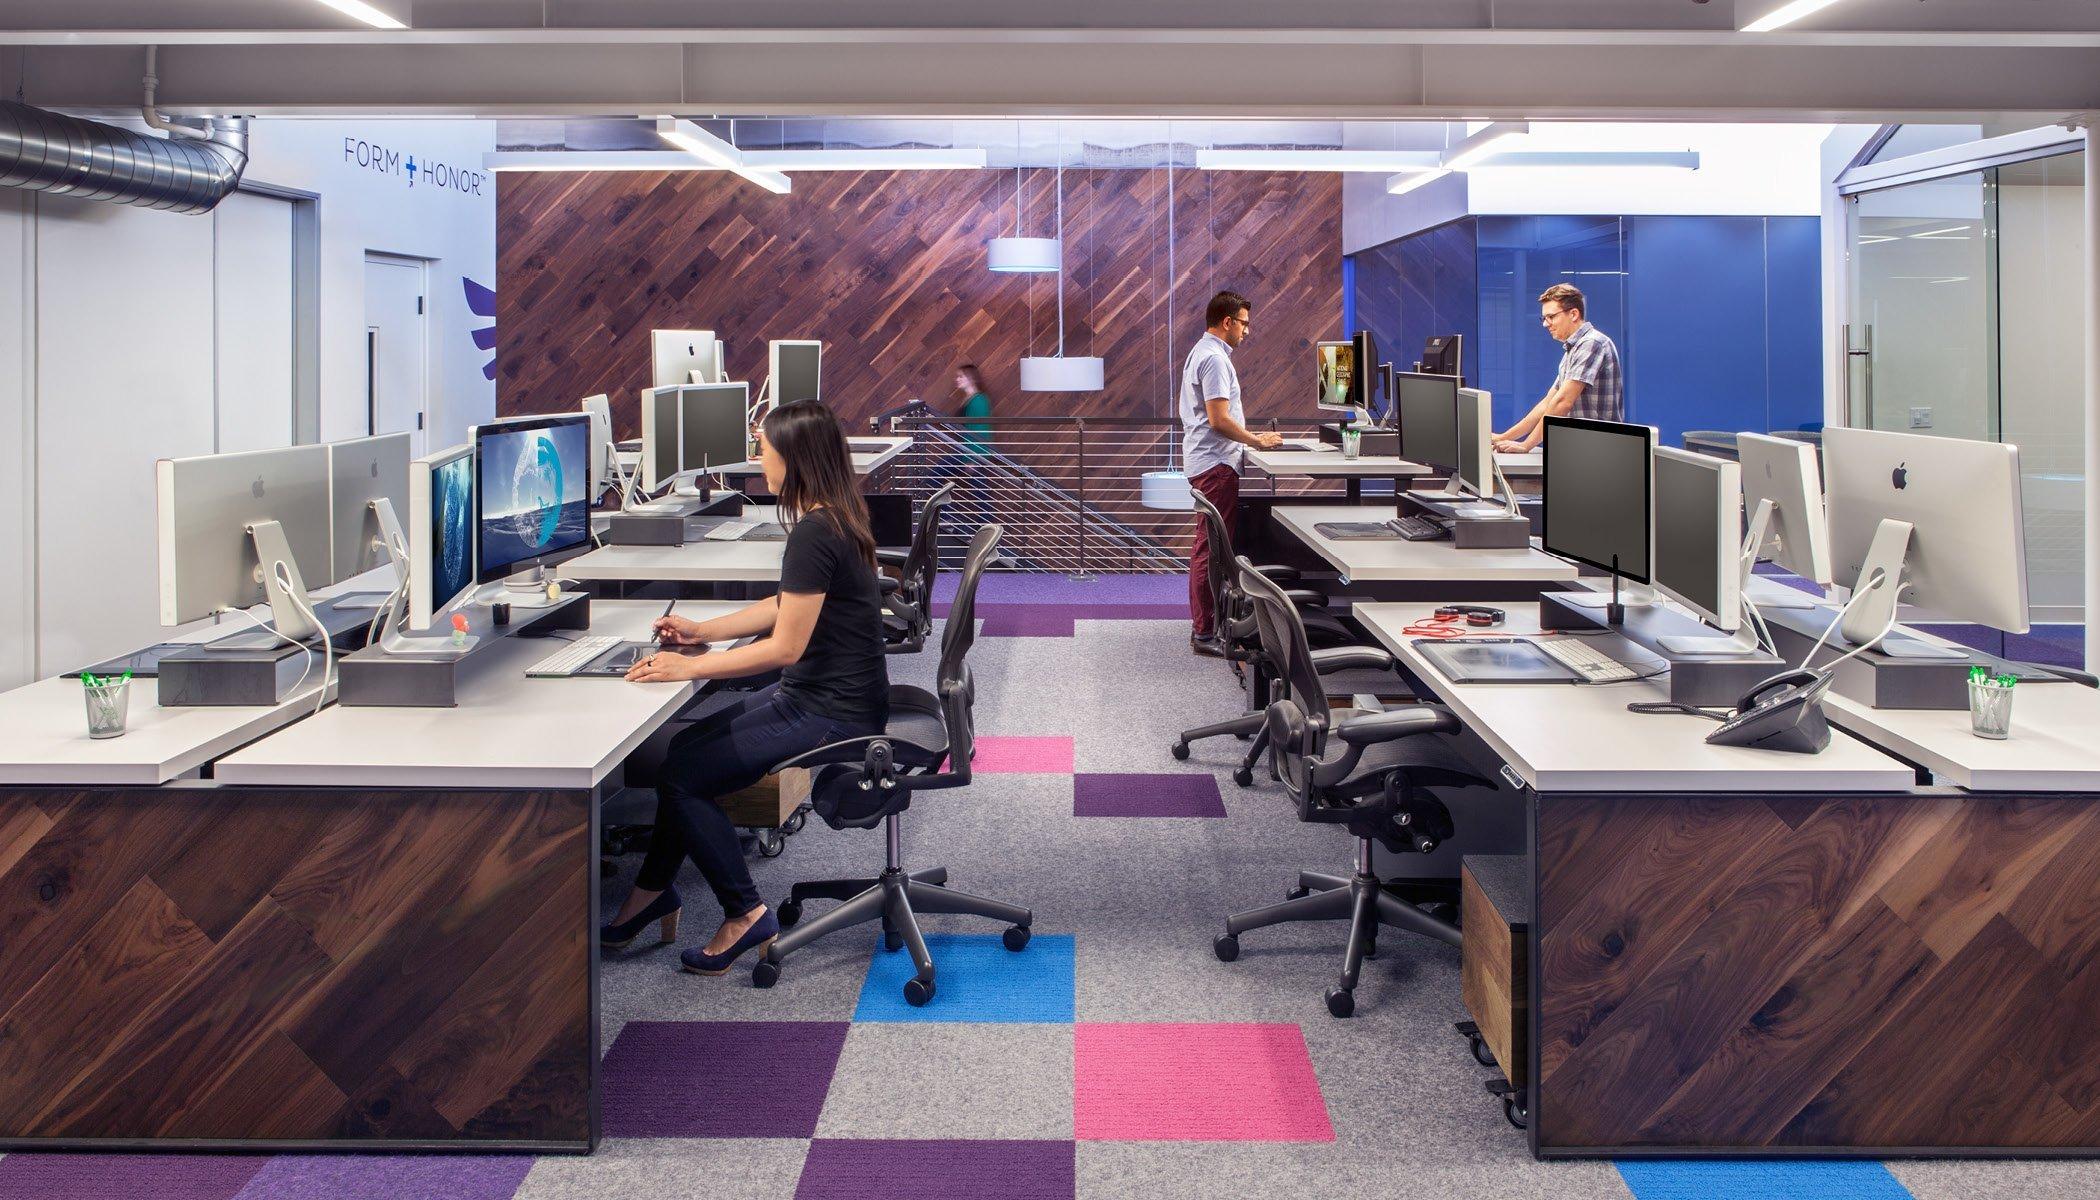 Inside capacity s los angeles office officelovin 39 for Mash studios lax